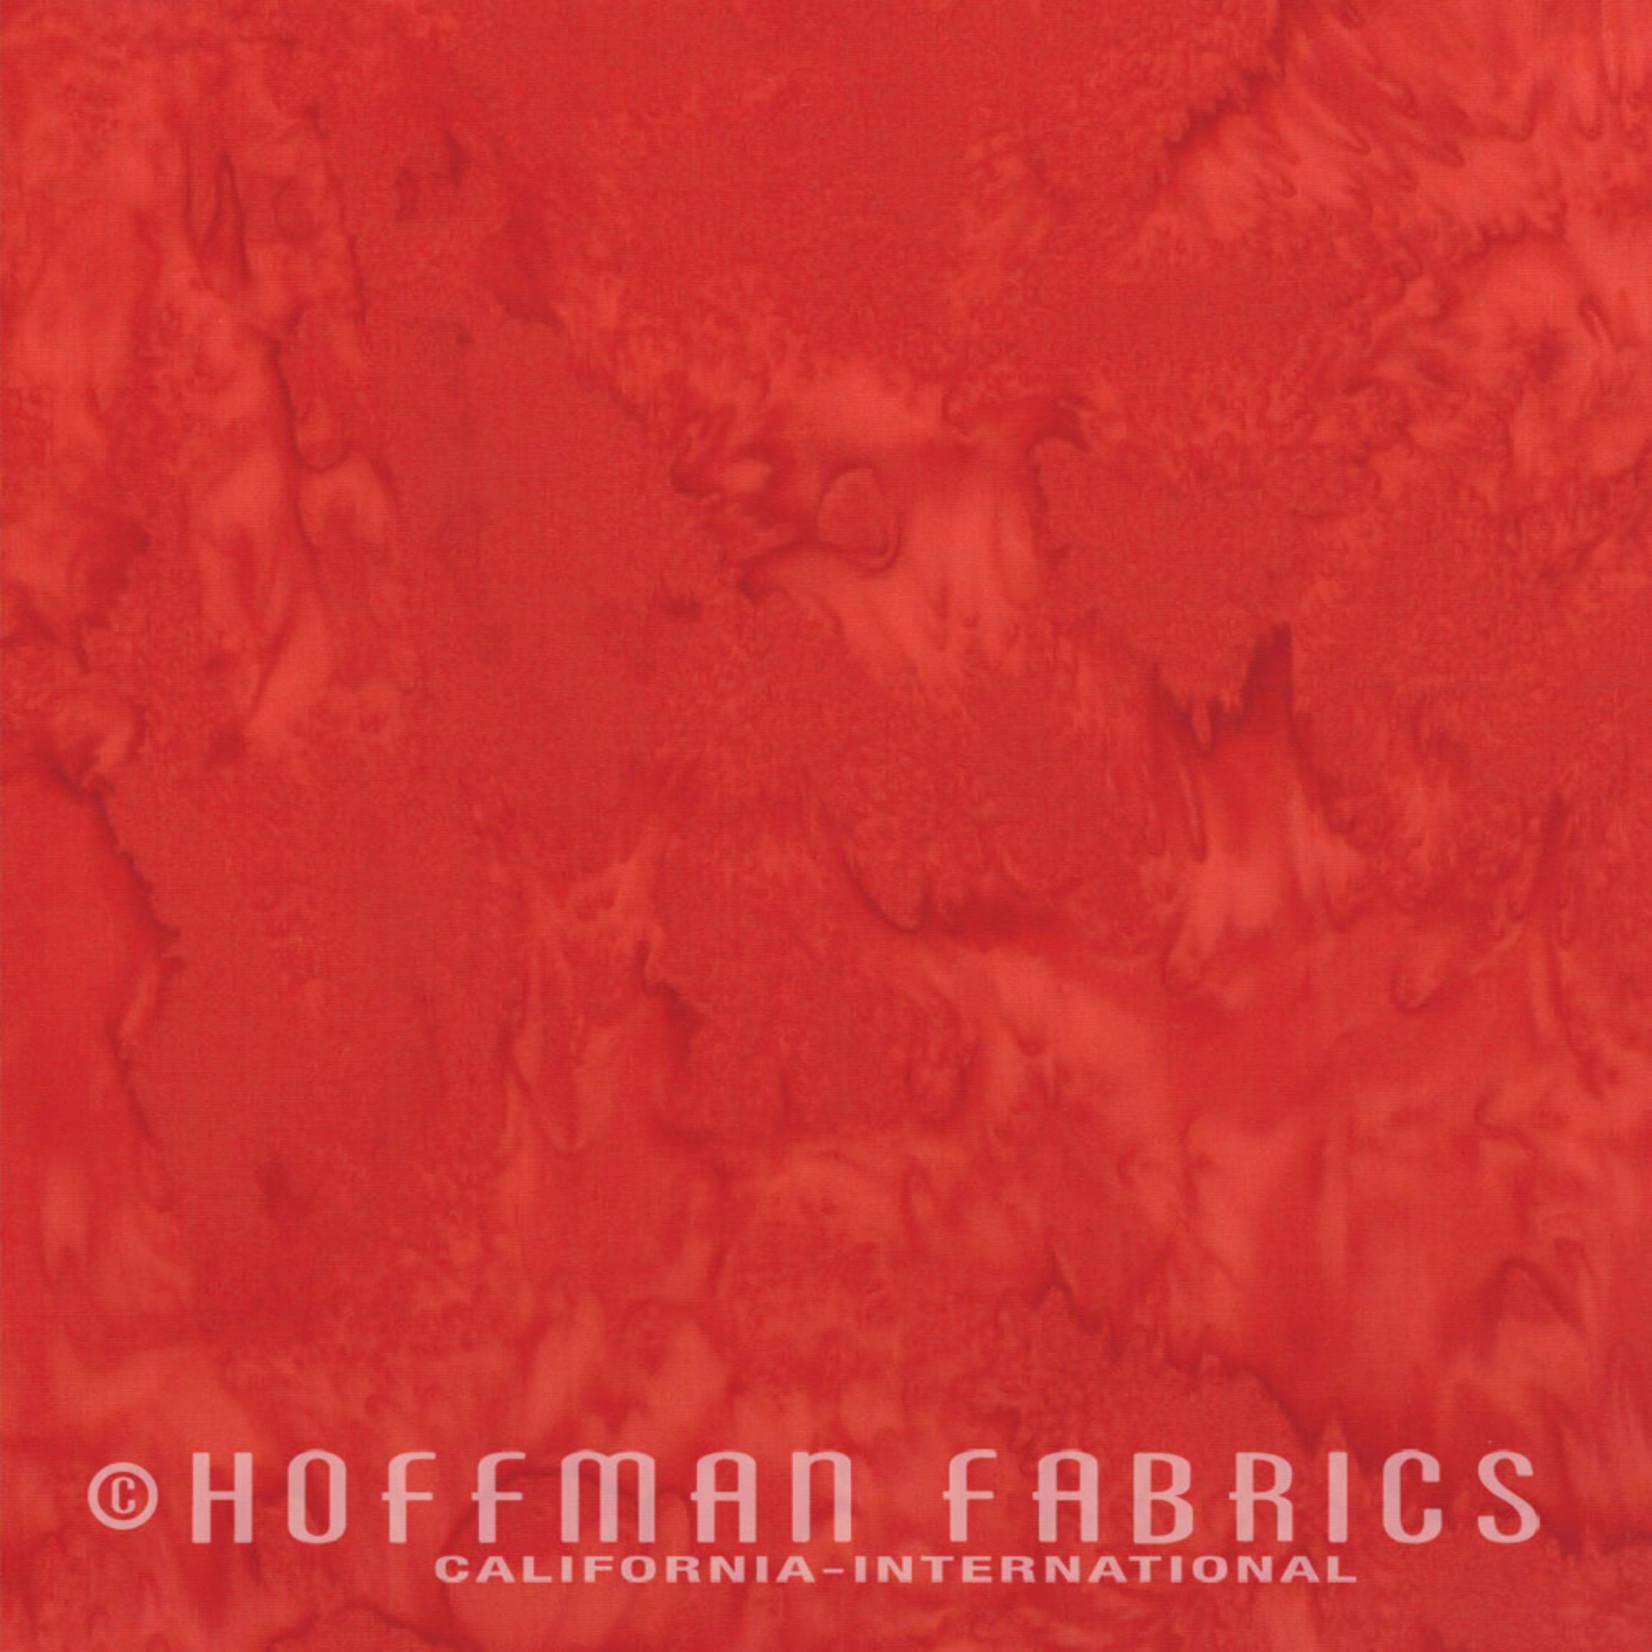 Hoffman Fabrics Watercolors 1895 - 444 Chilies